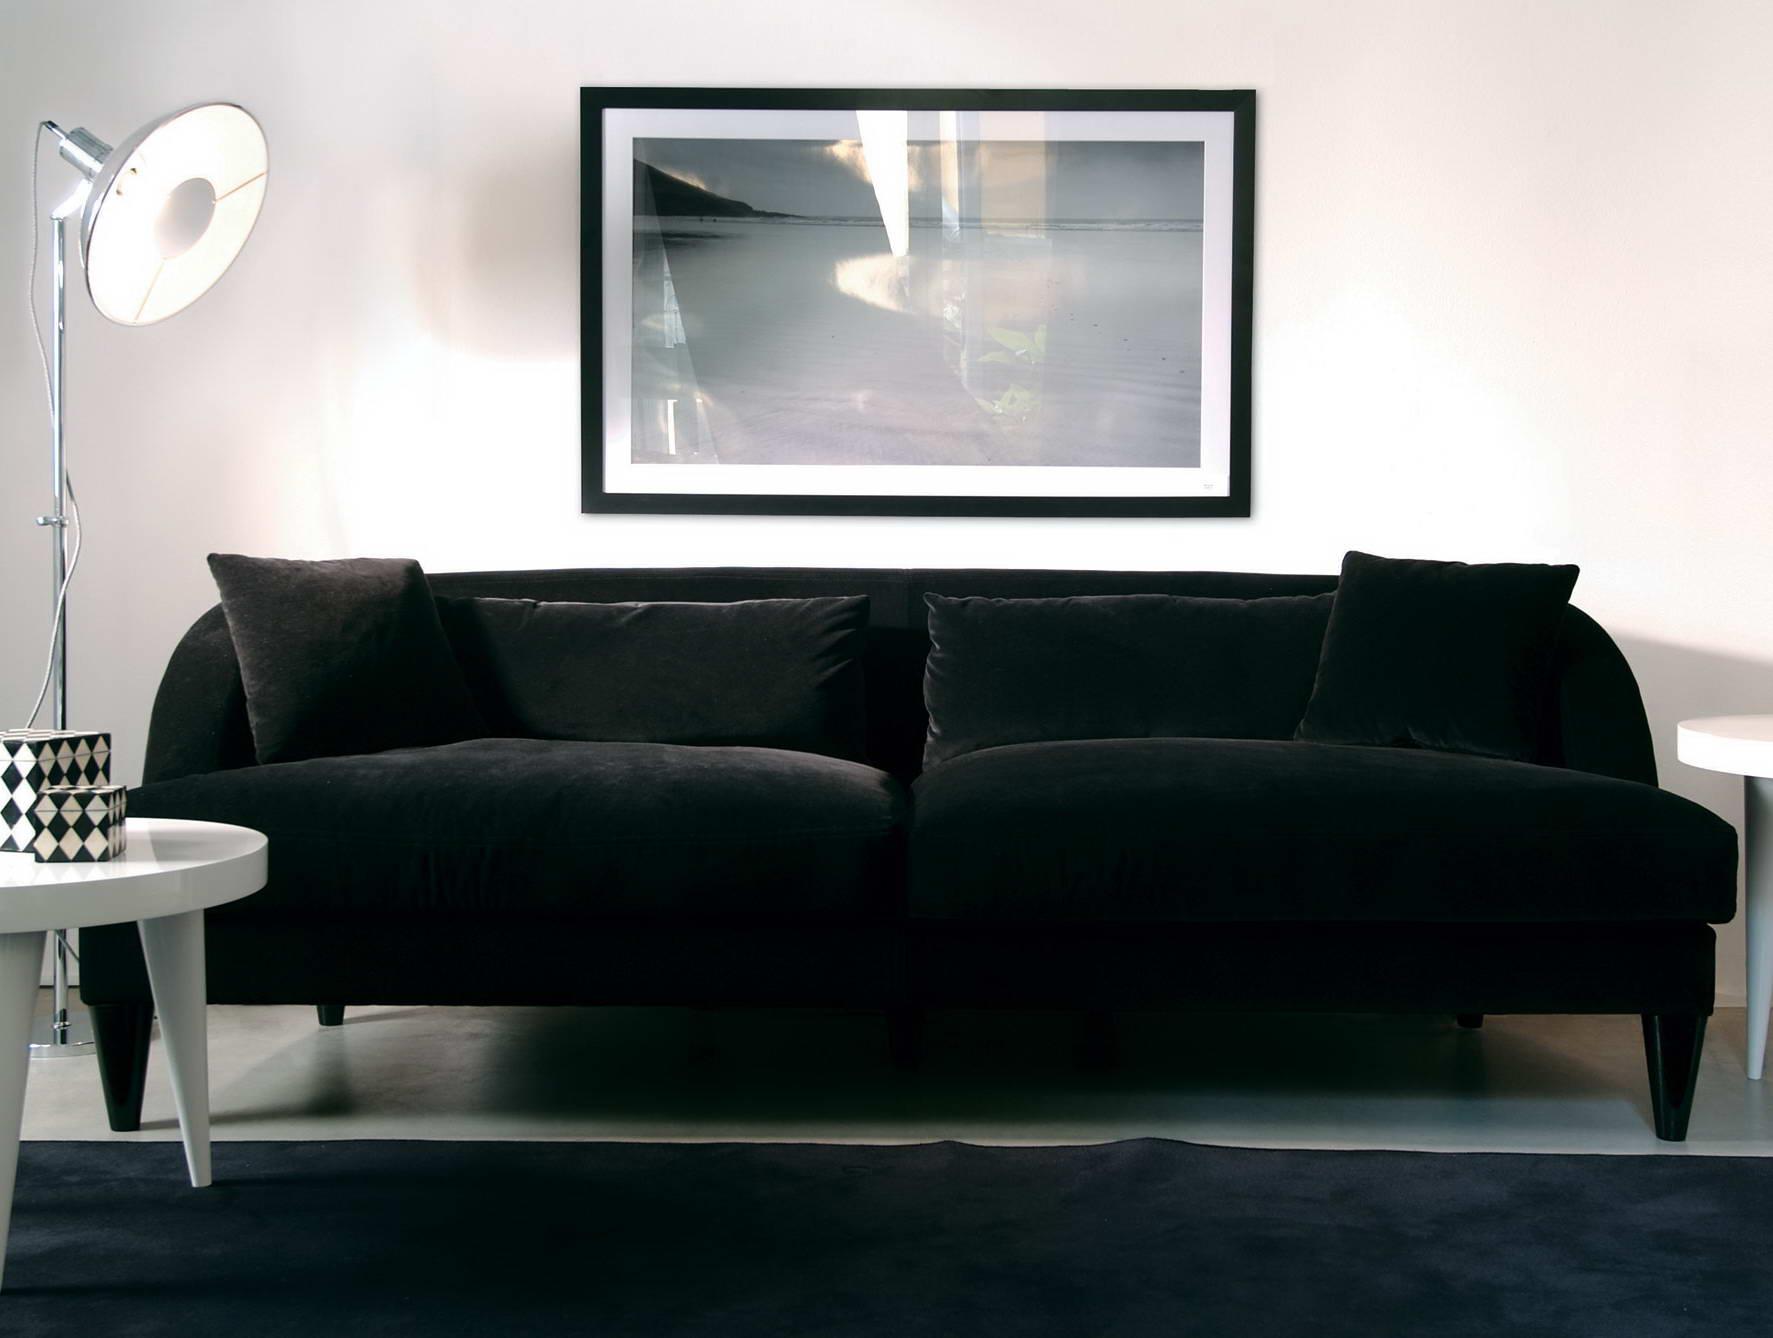 nella-vetrina-elle-modern-italian-round-lacquered-wood-dining-table-italian-dining-room-sets